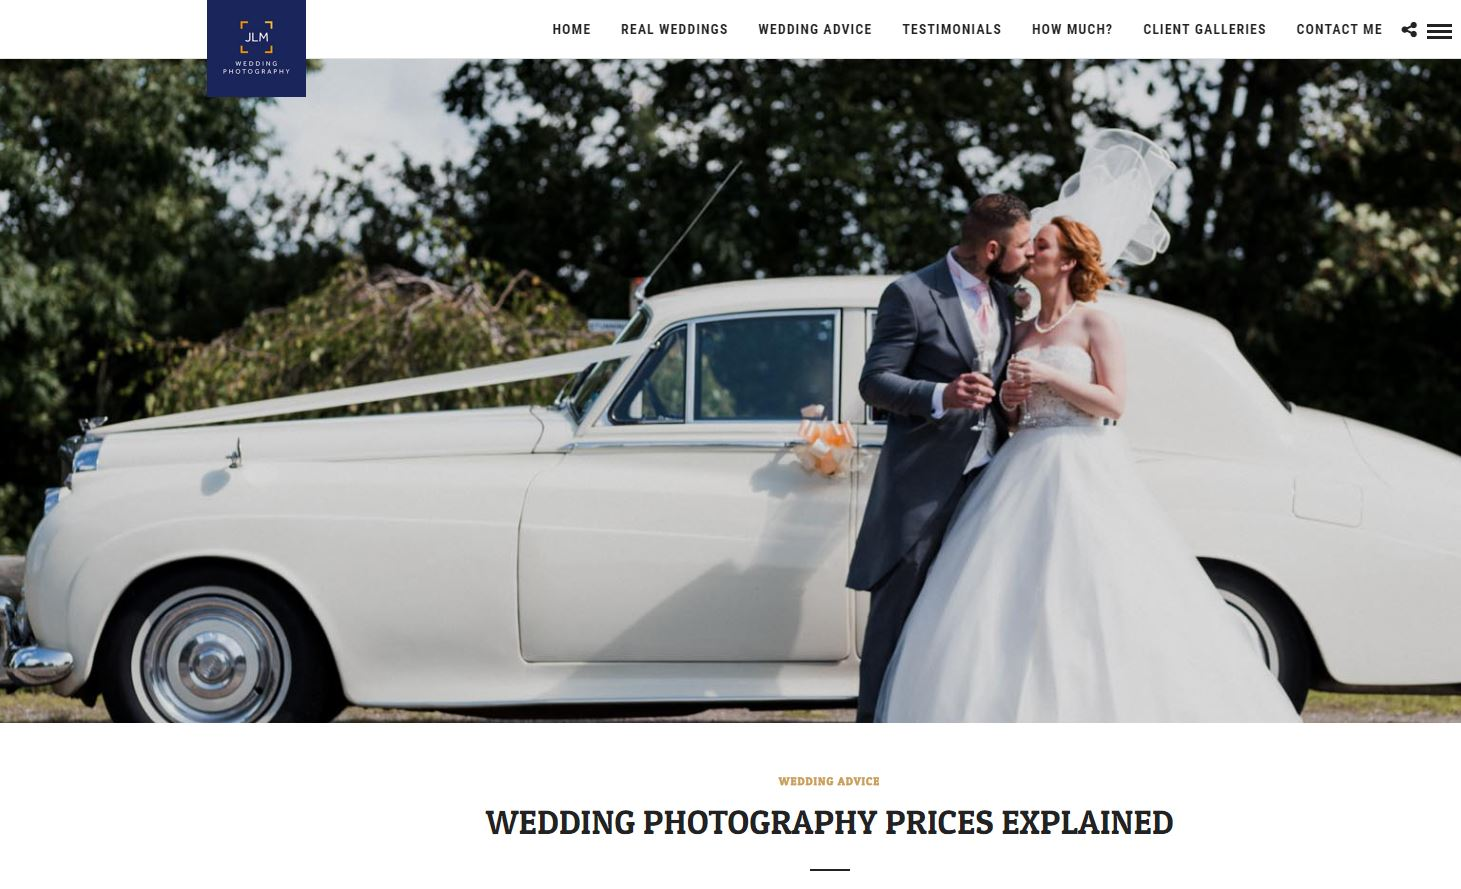 wedding photo prices explained